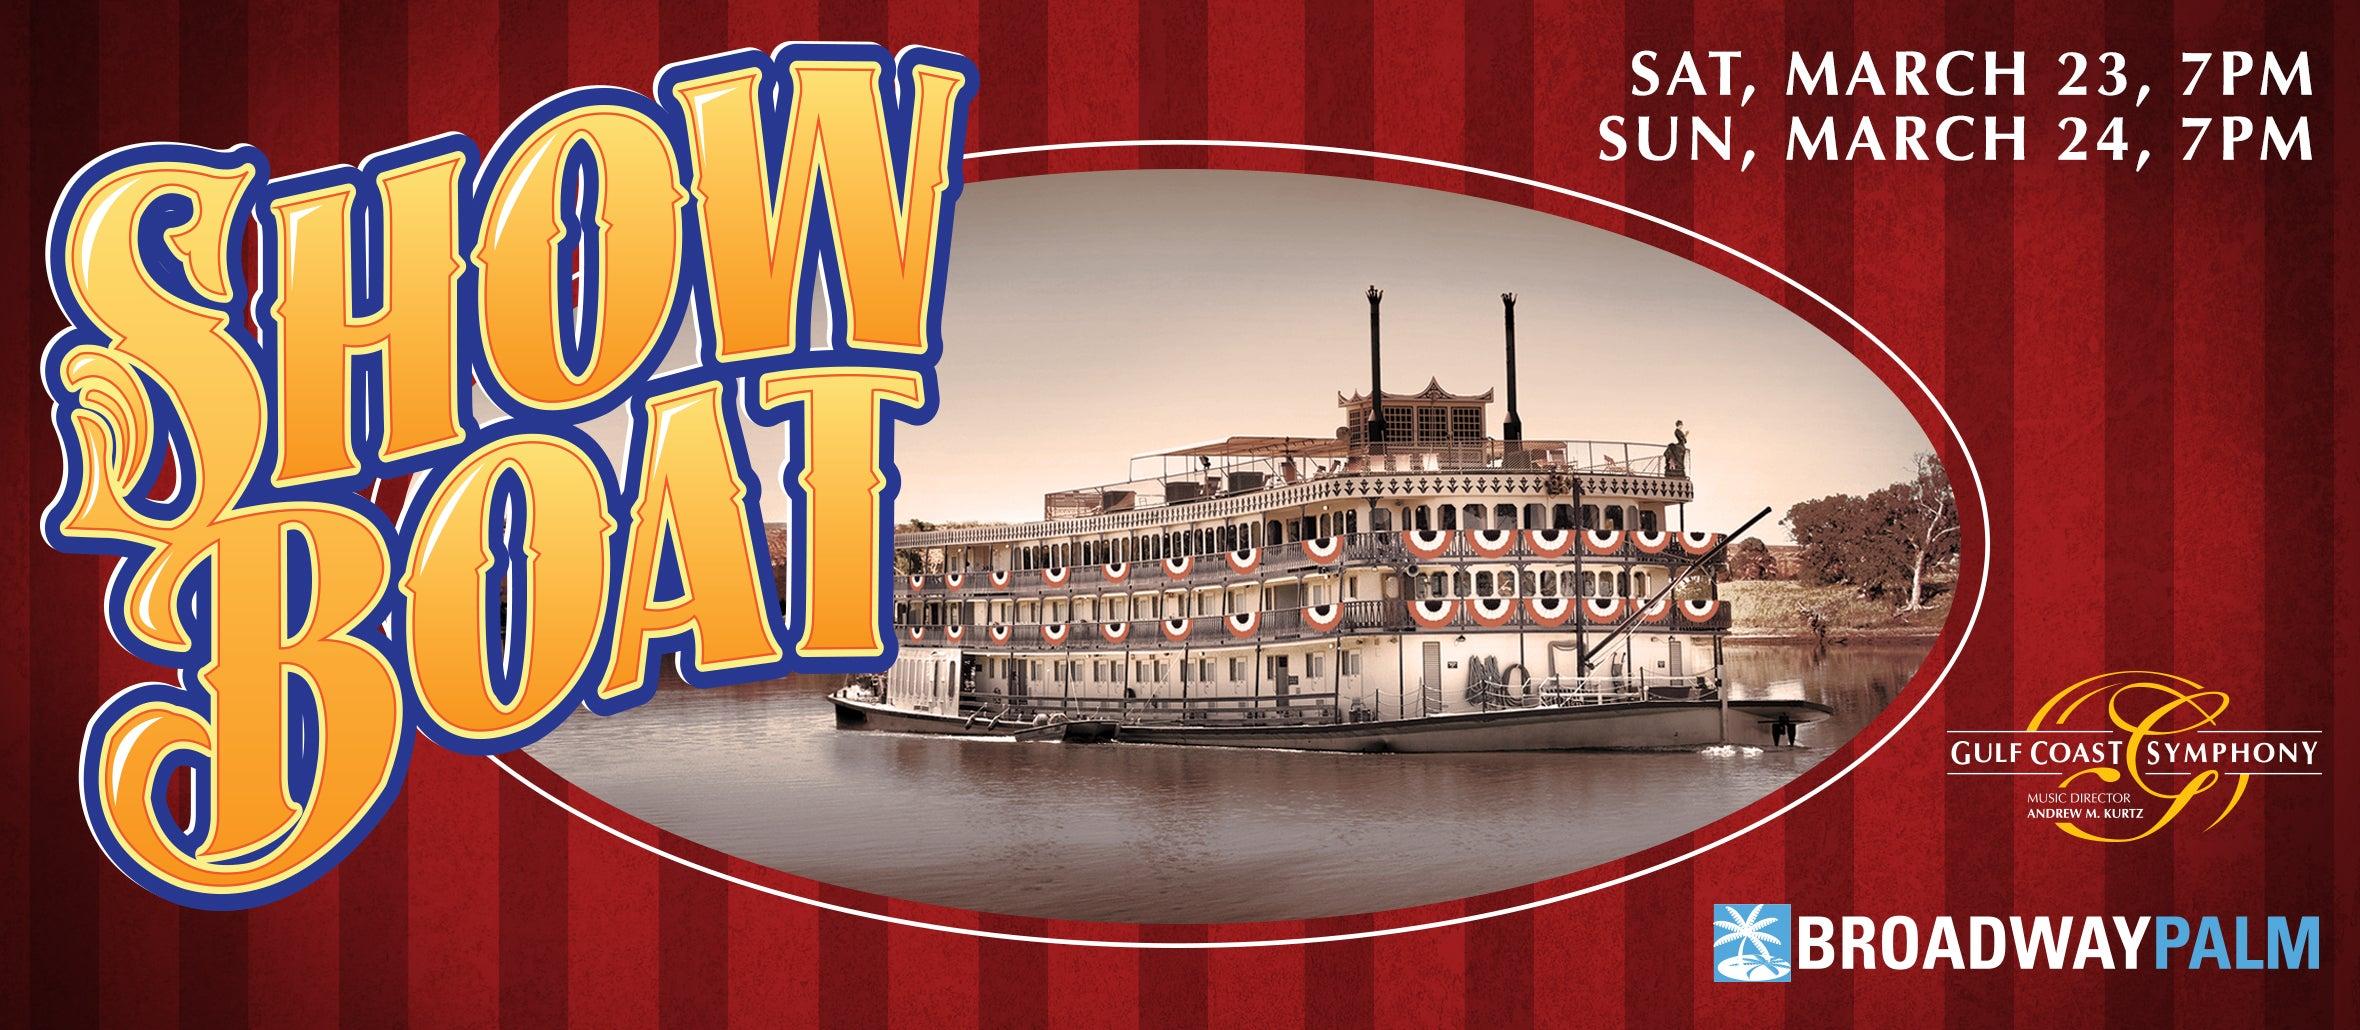 Gulf Coast Symphony: Show Boat